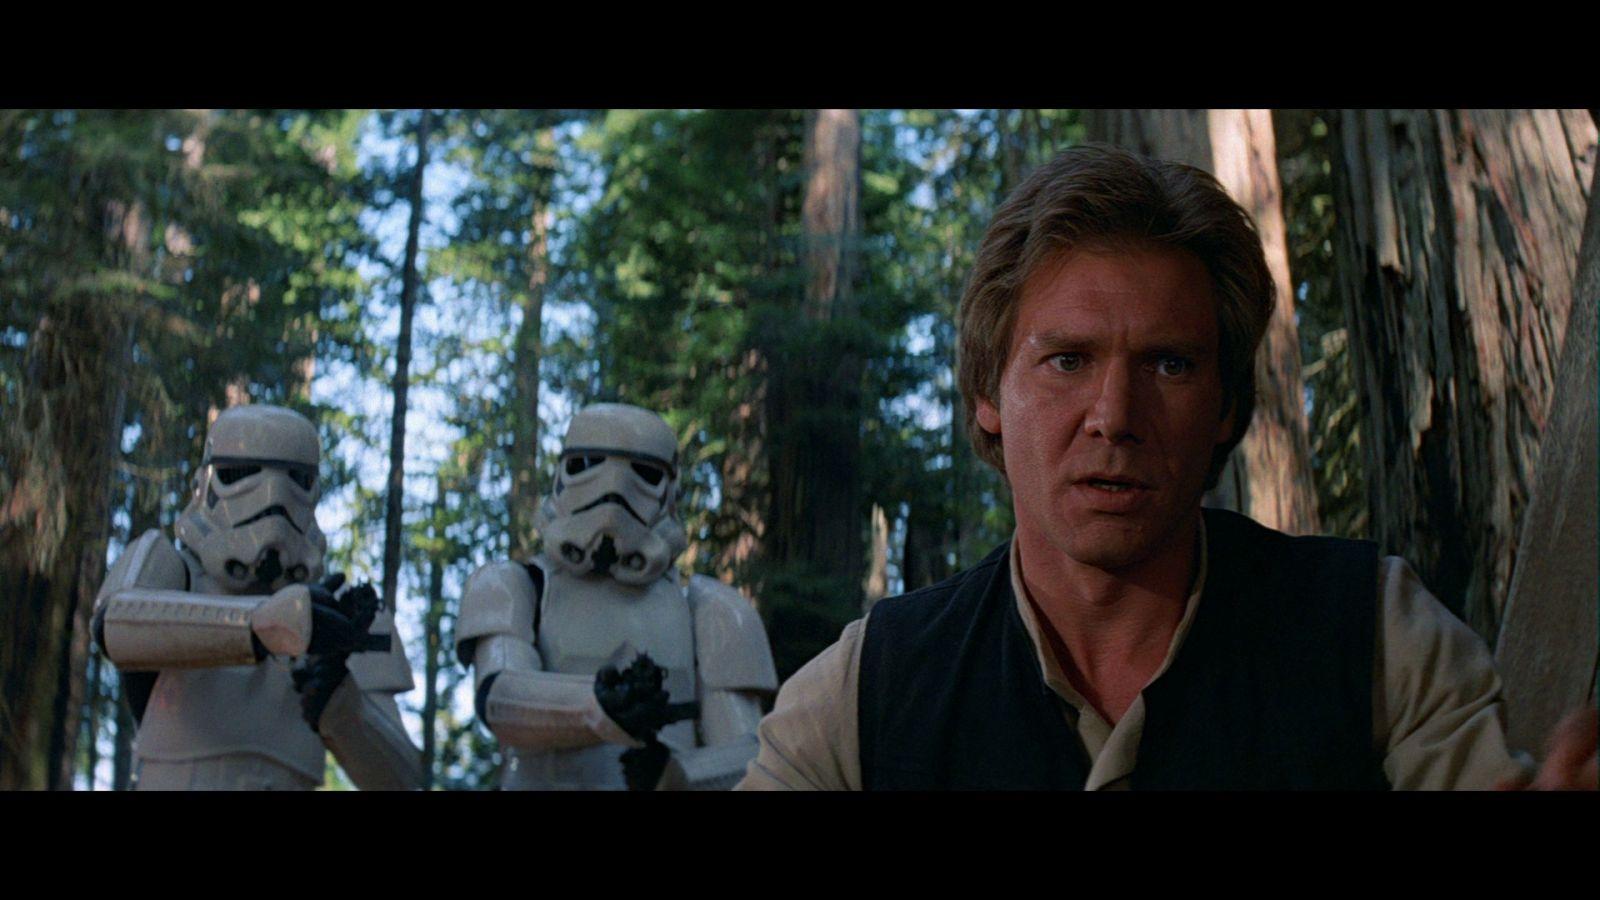 Star Wars Return of the Jedi Bluray Capture-86.jpg